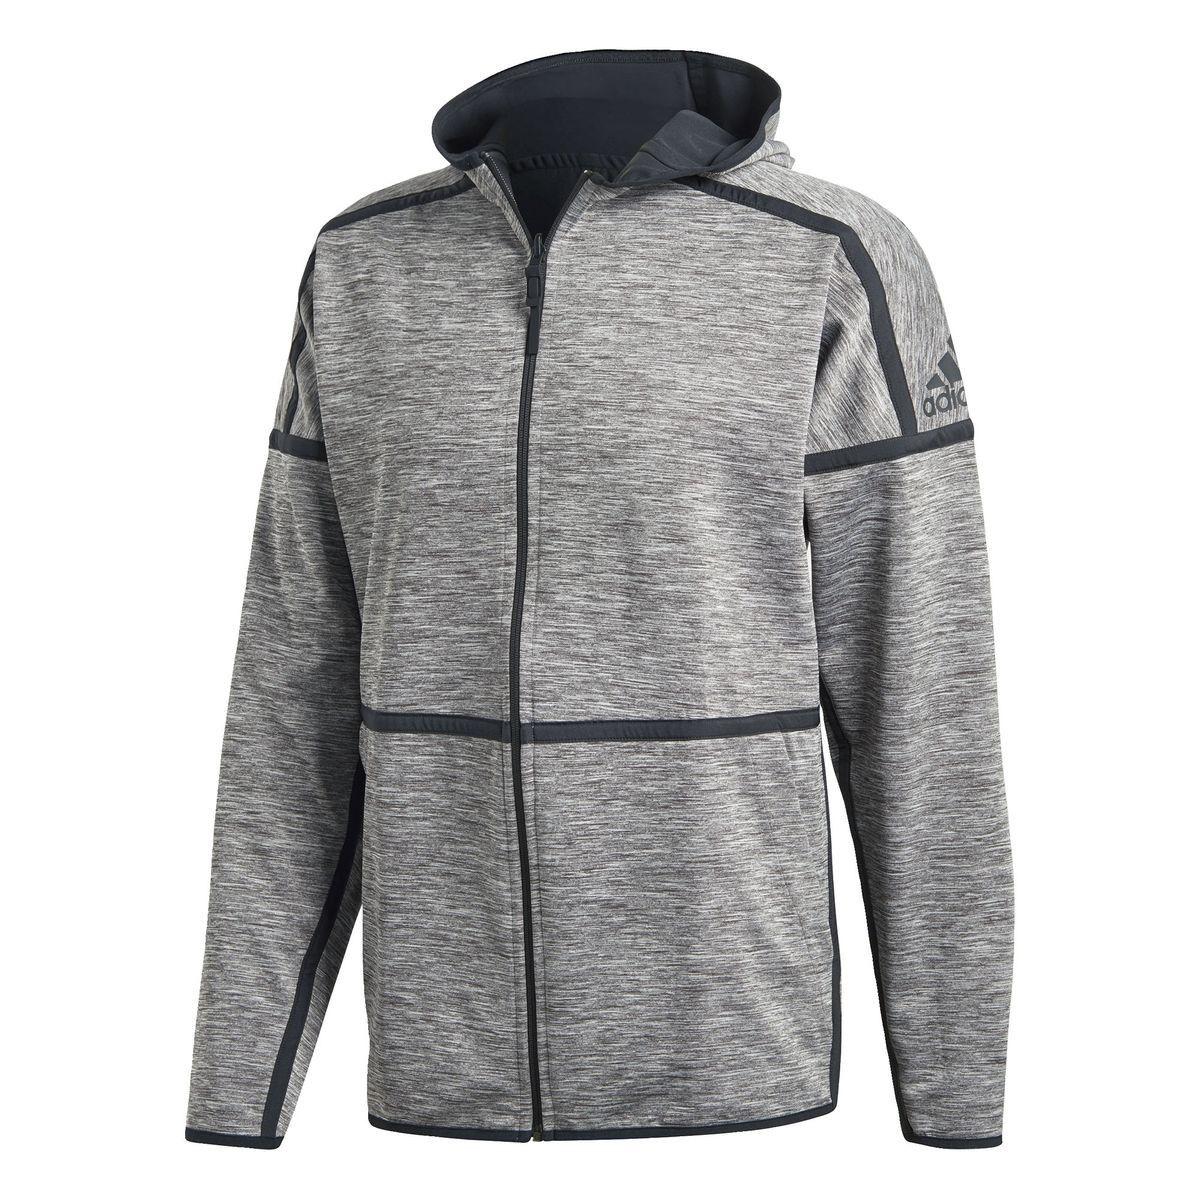 Veste Adidas Z.n.e. Reversible Taille : M;S;XL;XXS;2XL;L